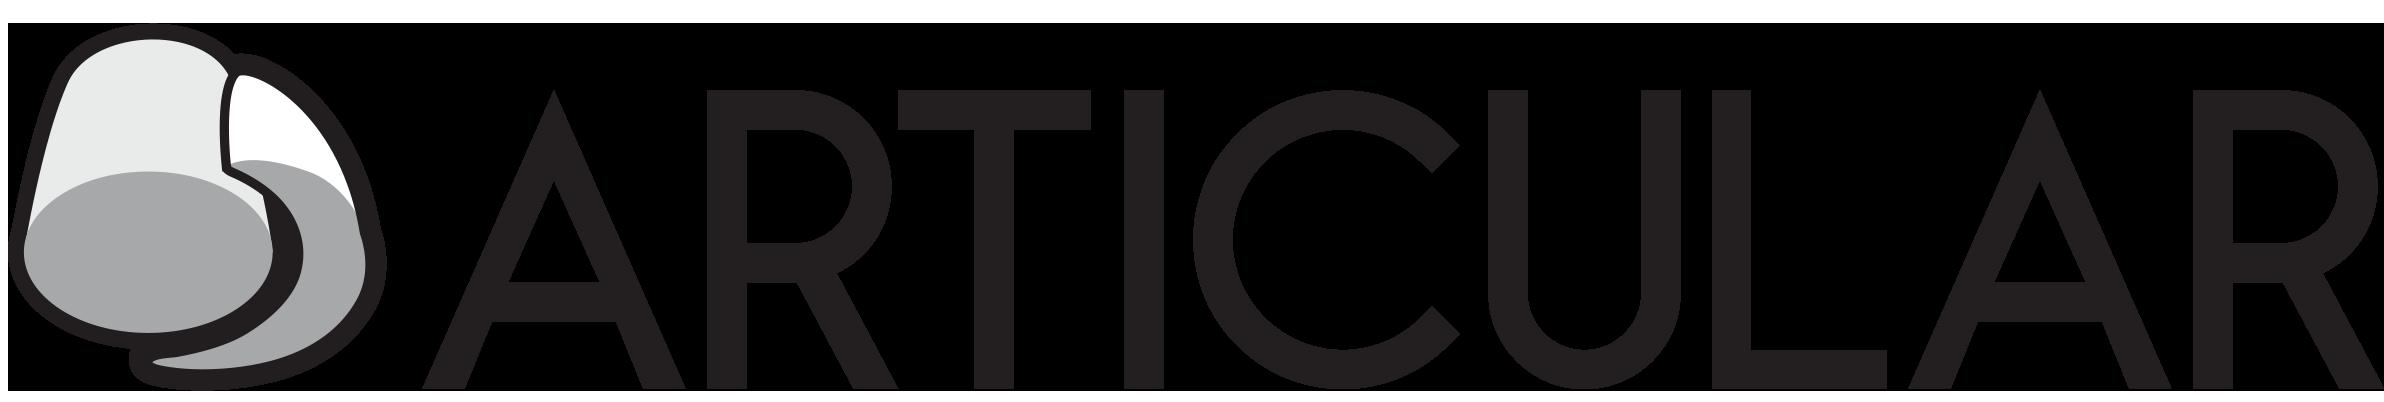 Articular_logo